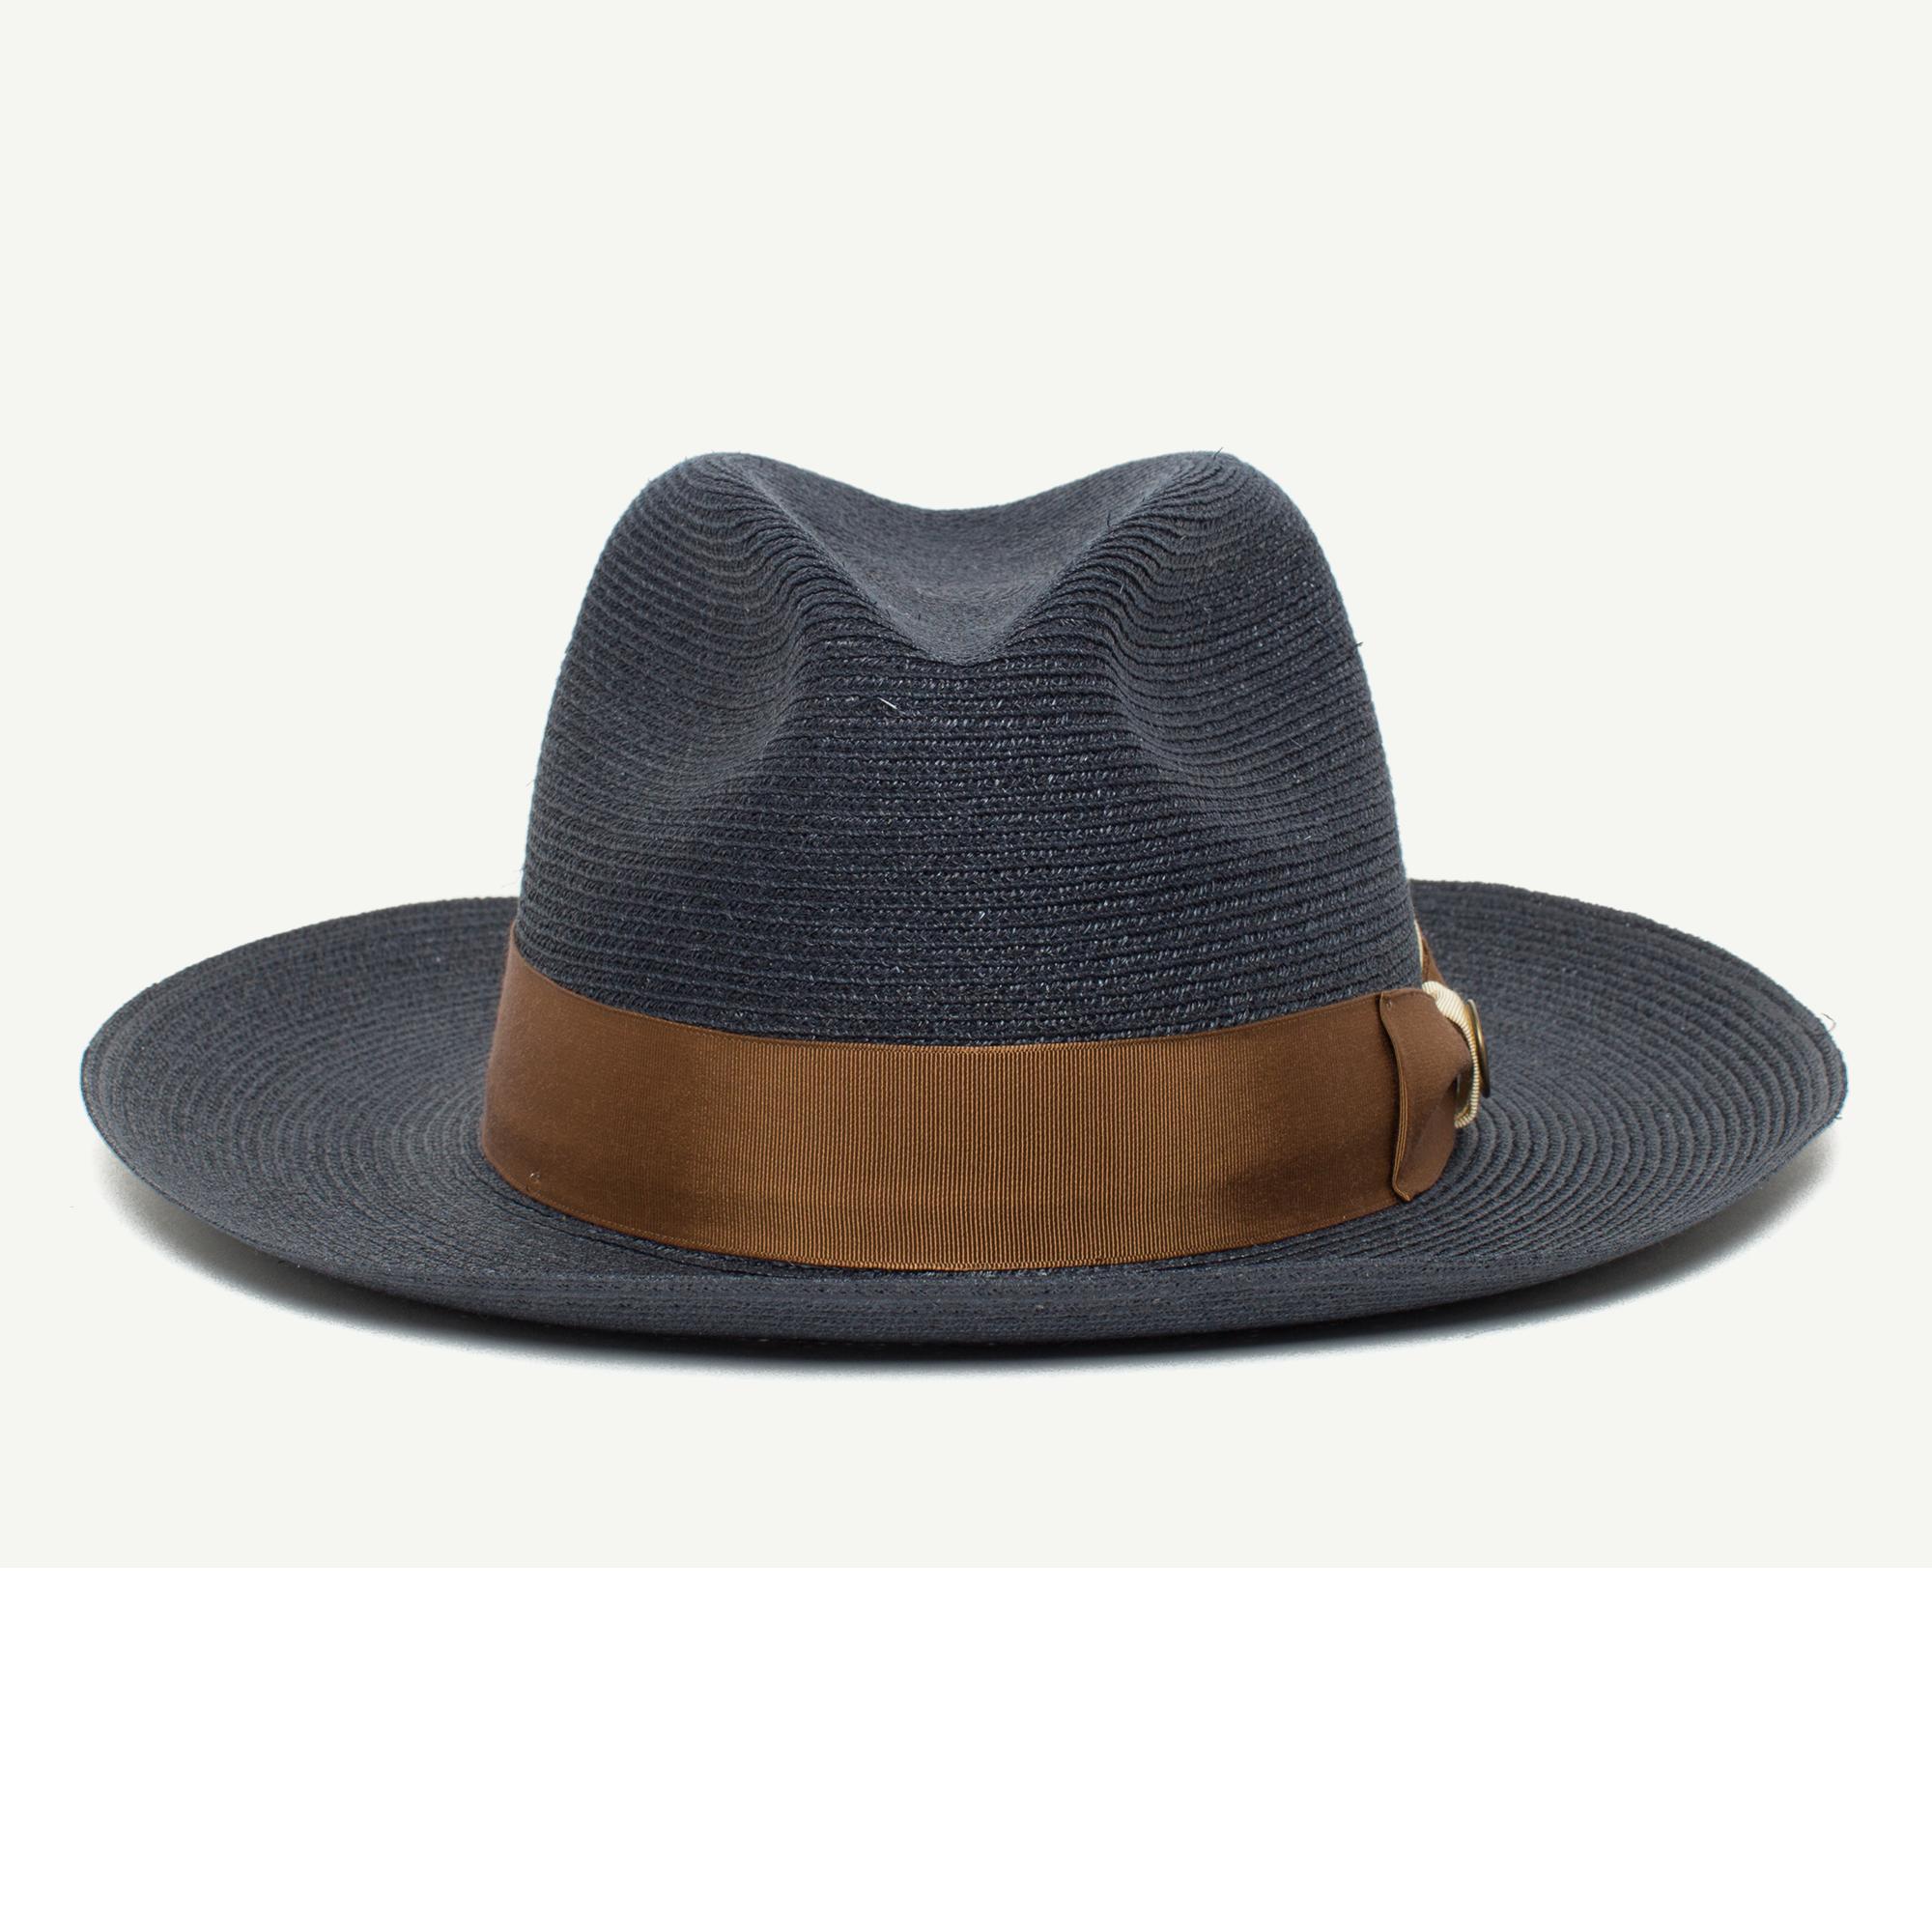 65e200915a74c Butch Jackson in 2019 | mens hats | Dress hats, Fedora hat, Straw fedora